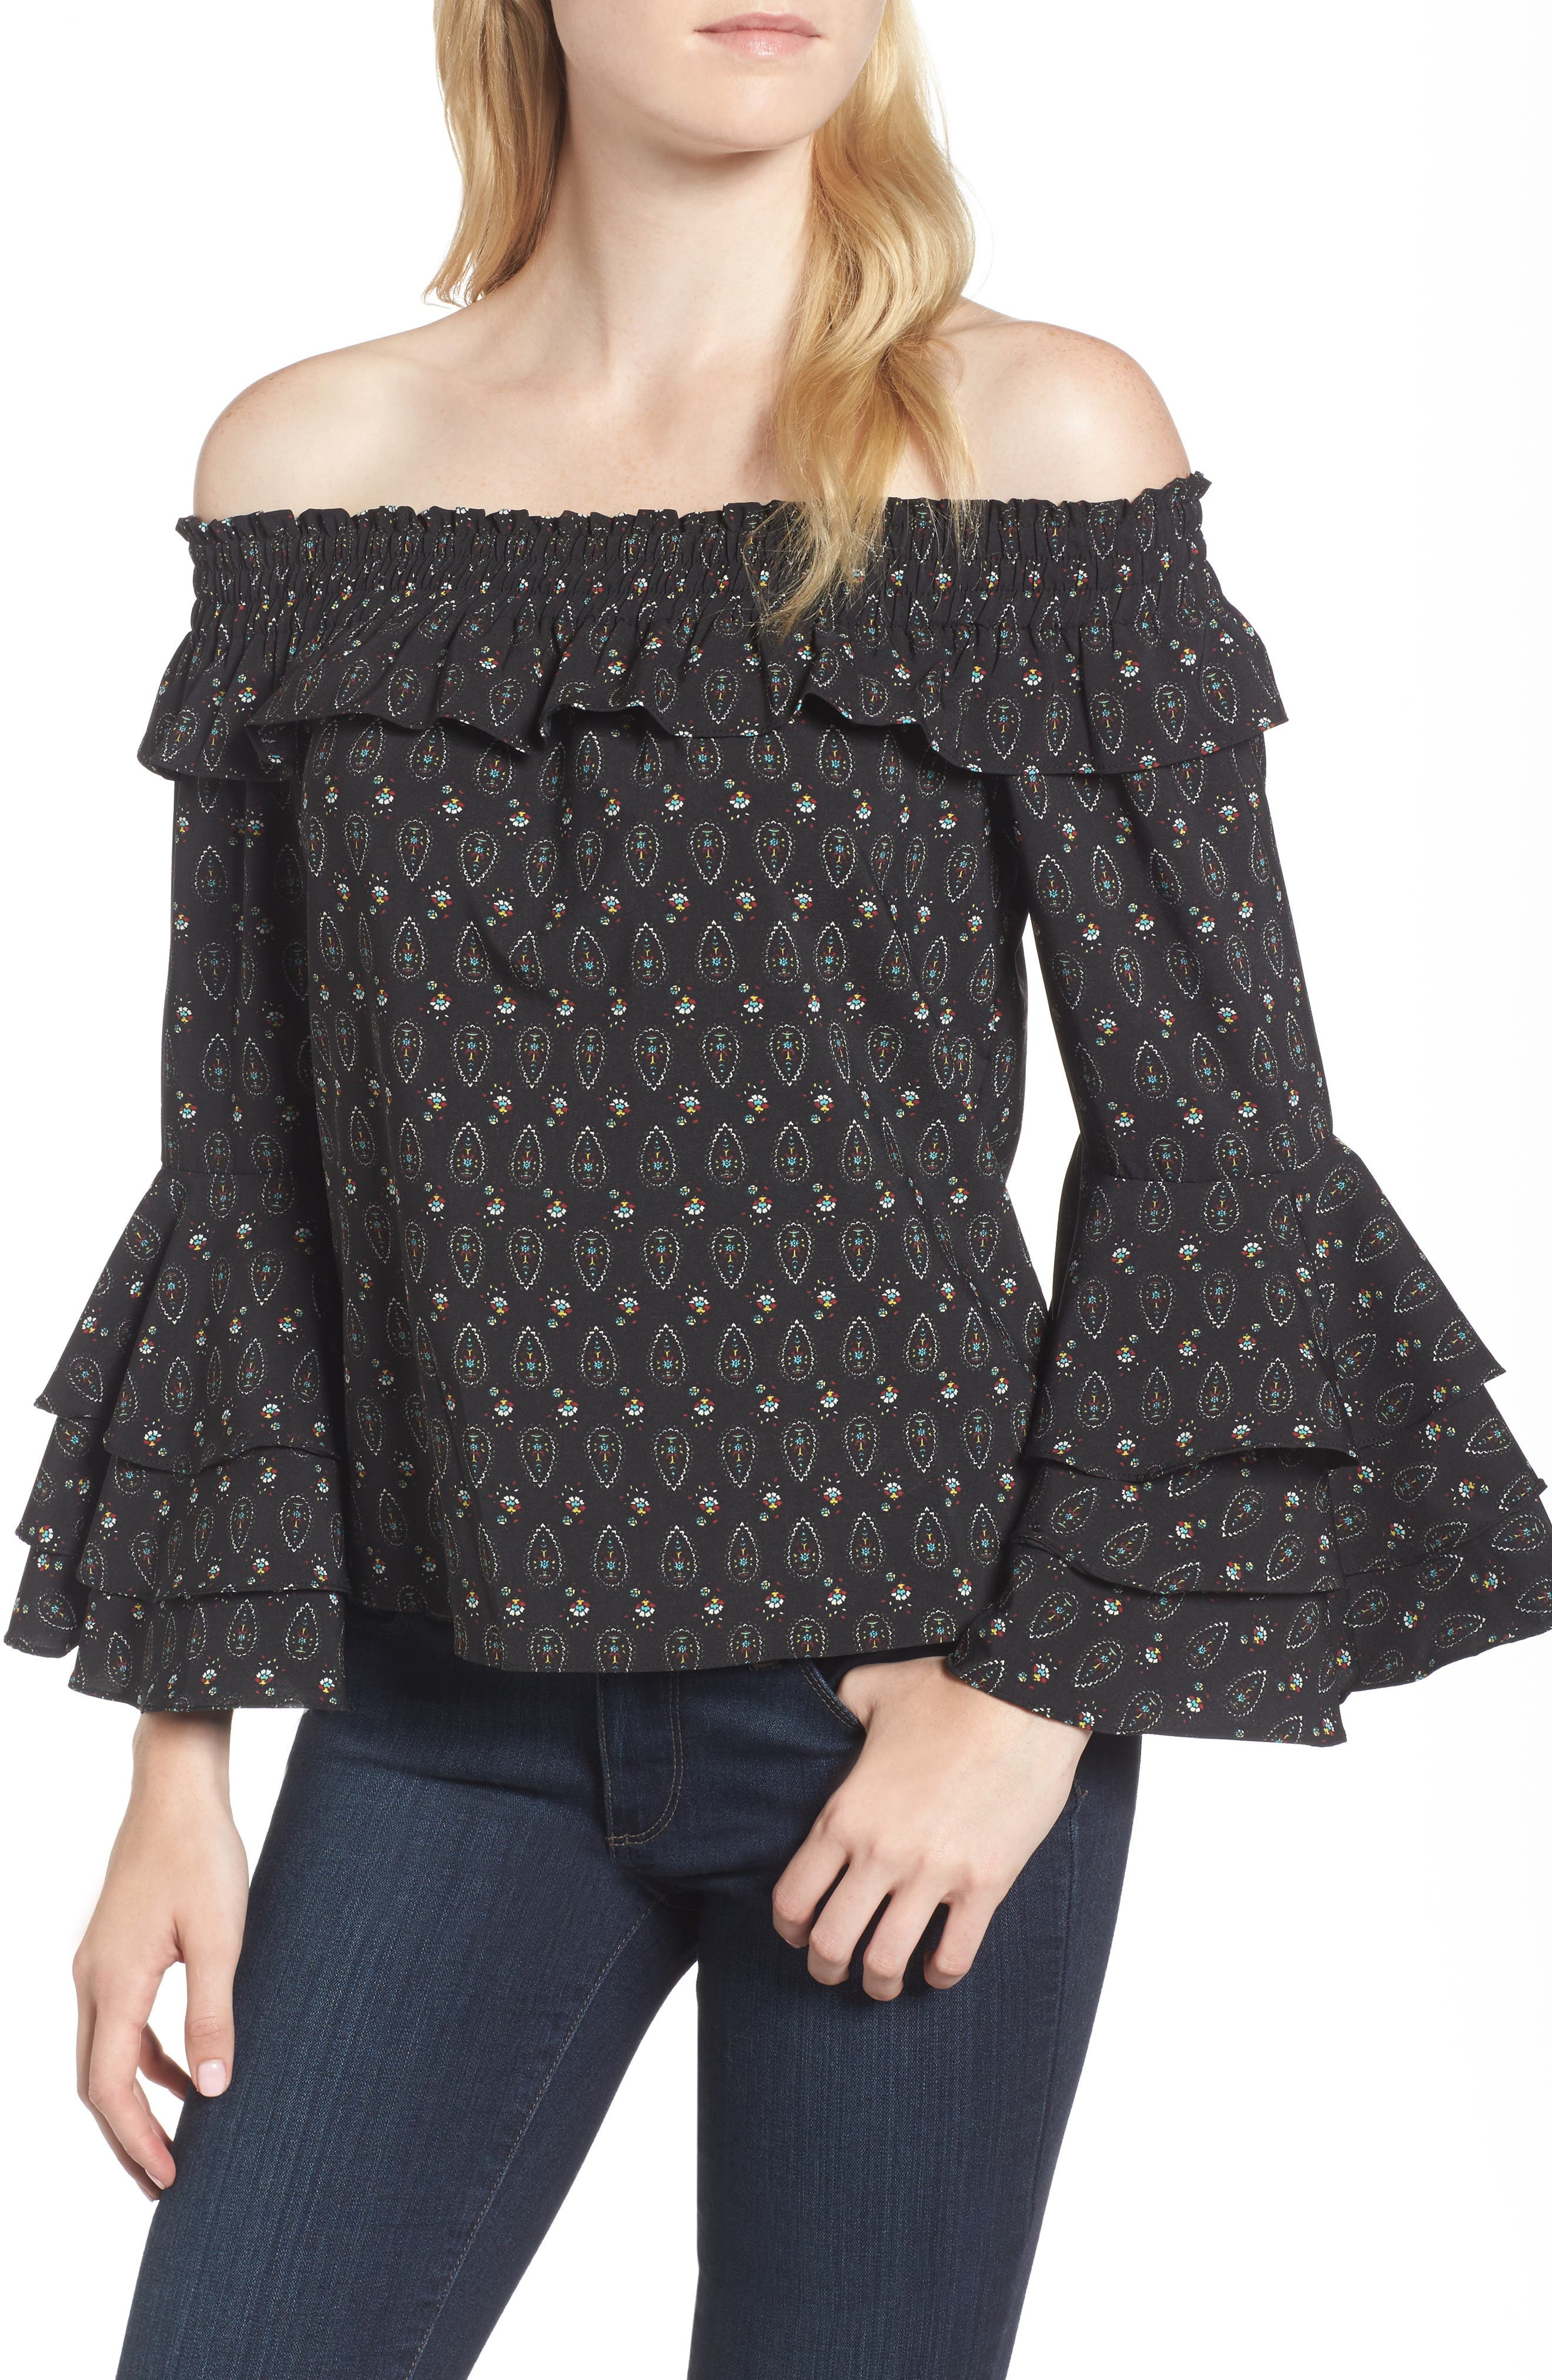 Off the Shoulder Top,                         Main,                         color, Black/ Multi